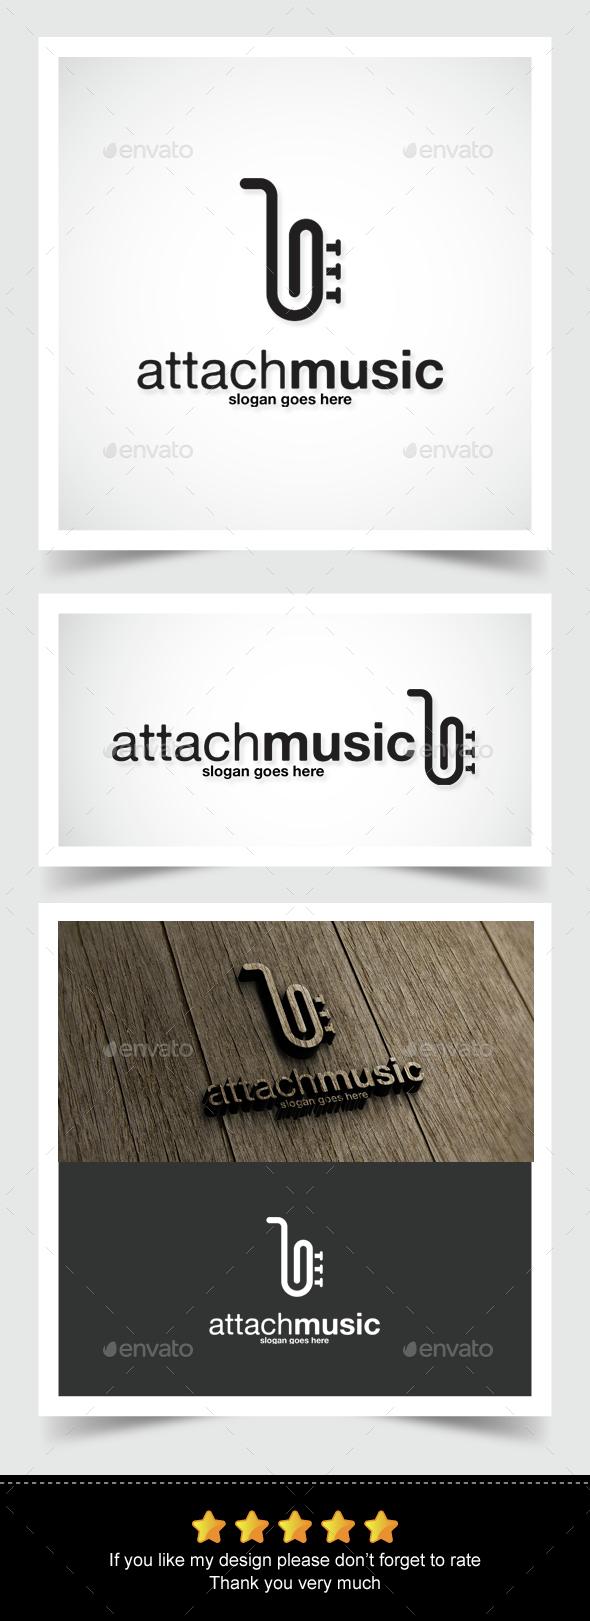 Attach Music Logo